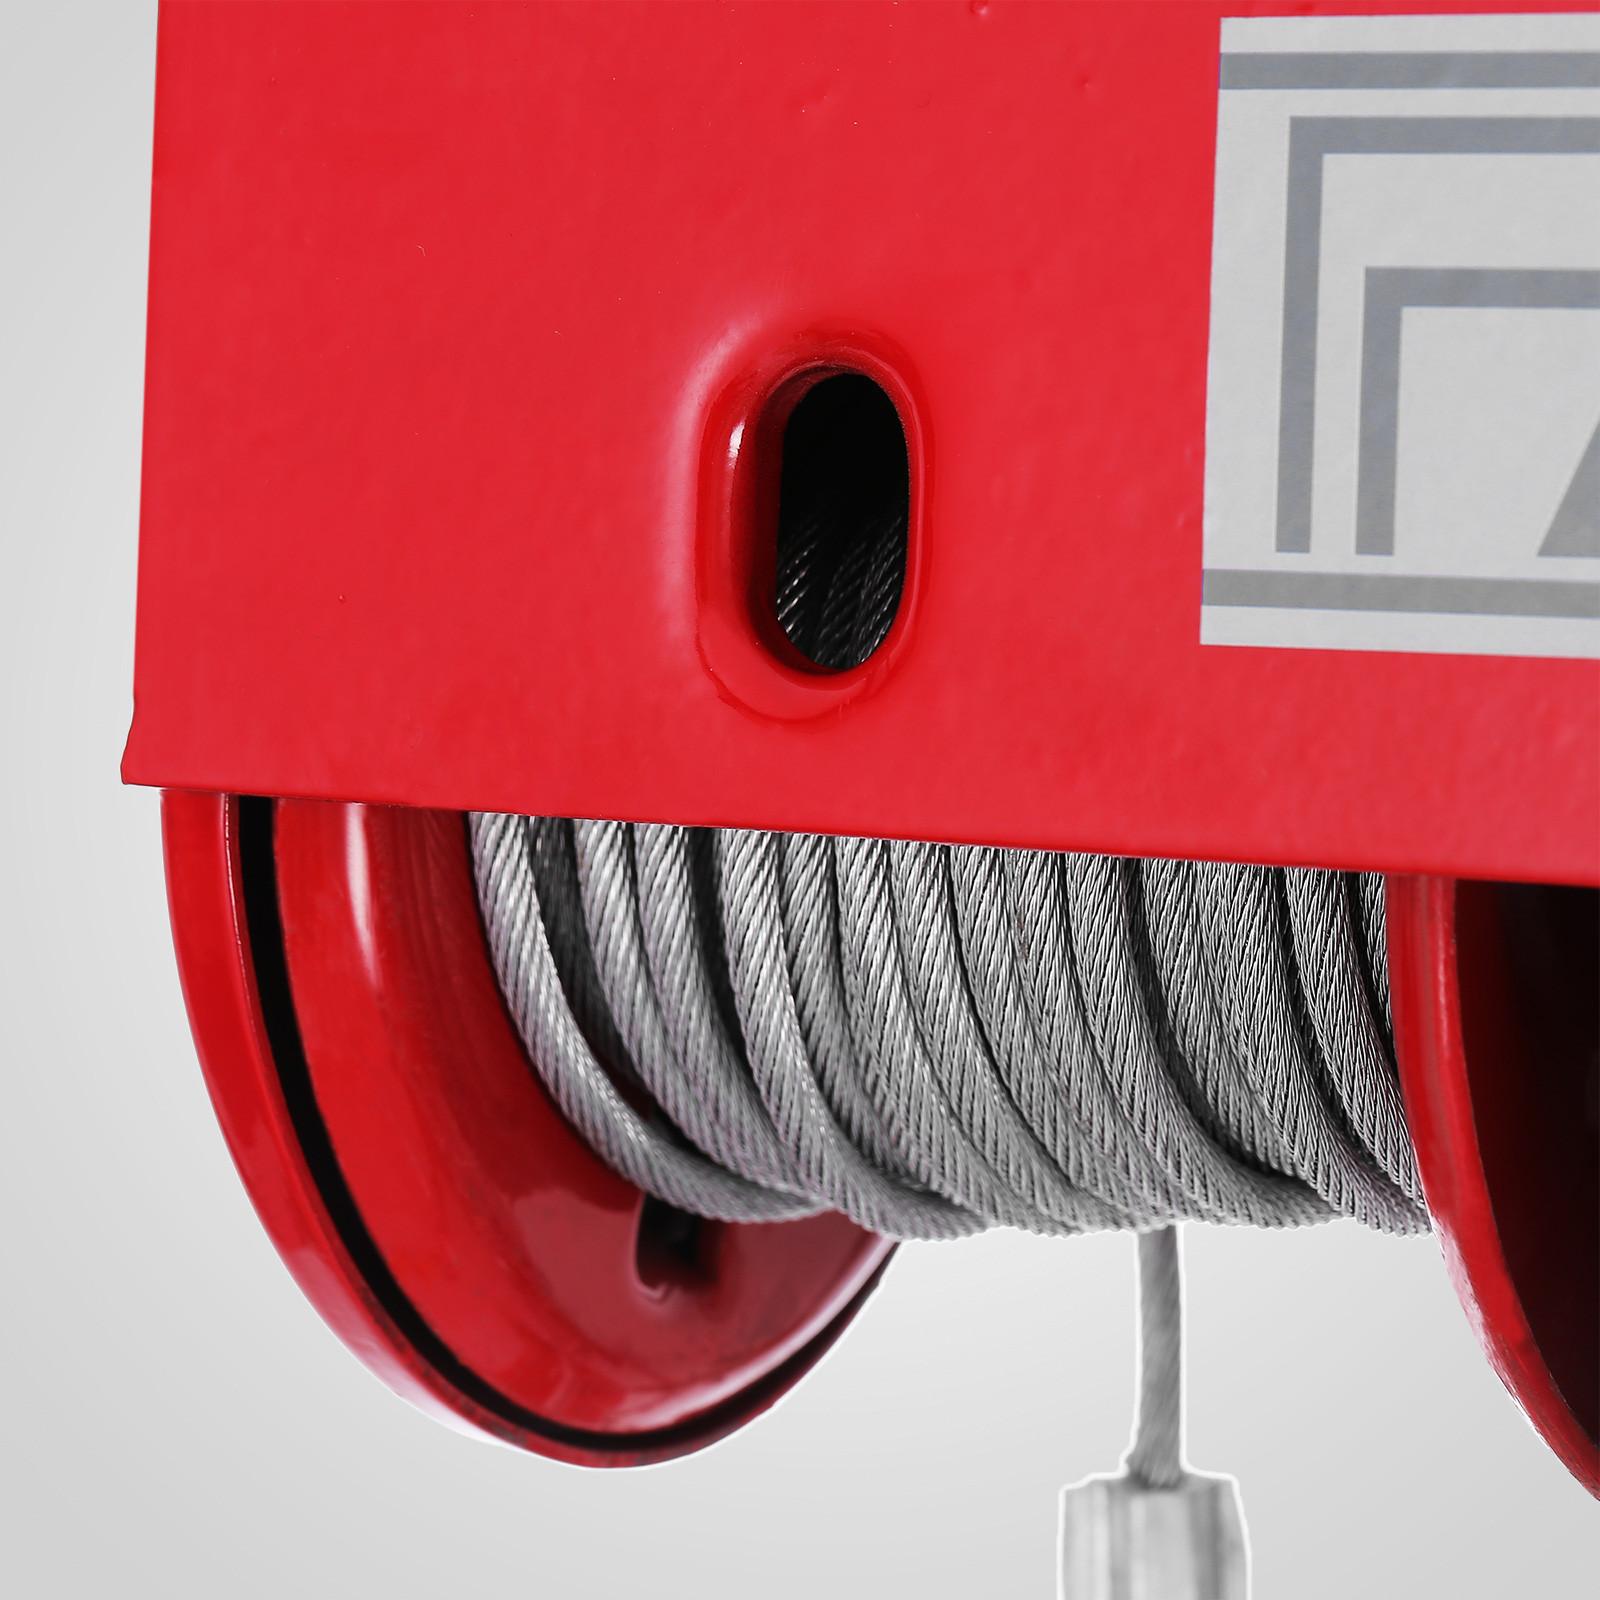 100kg-900kg-Electric-Hoist-Winch-Lifting-Engine-Crane-Cable-Lift-Hook-Garage miniature 20